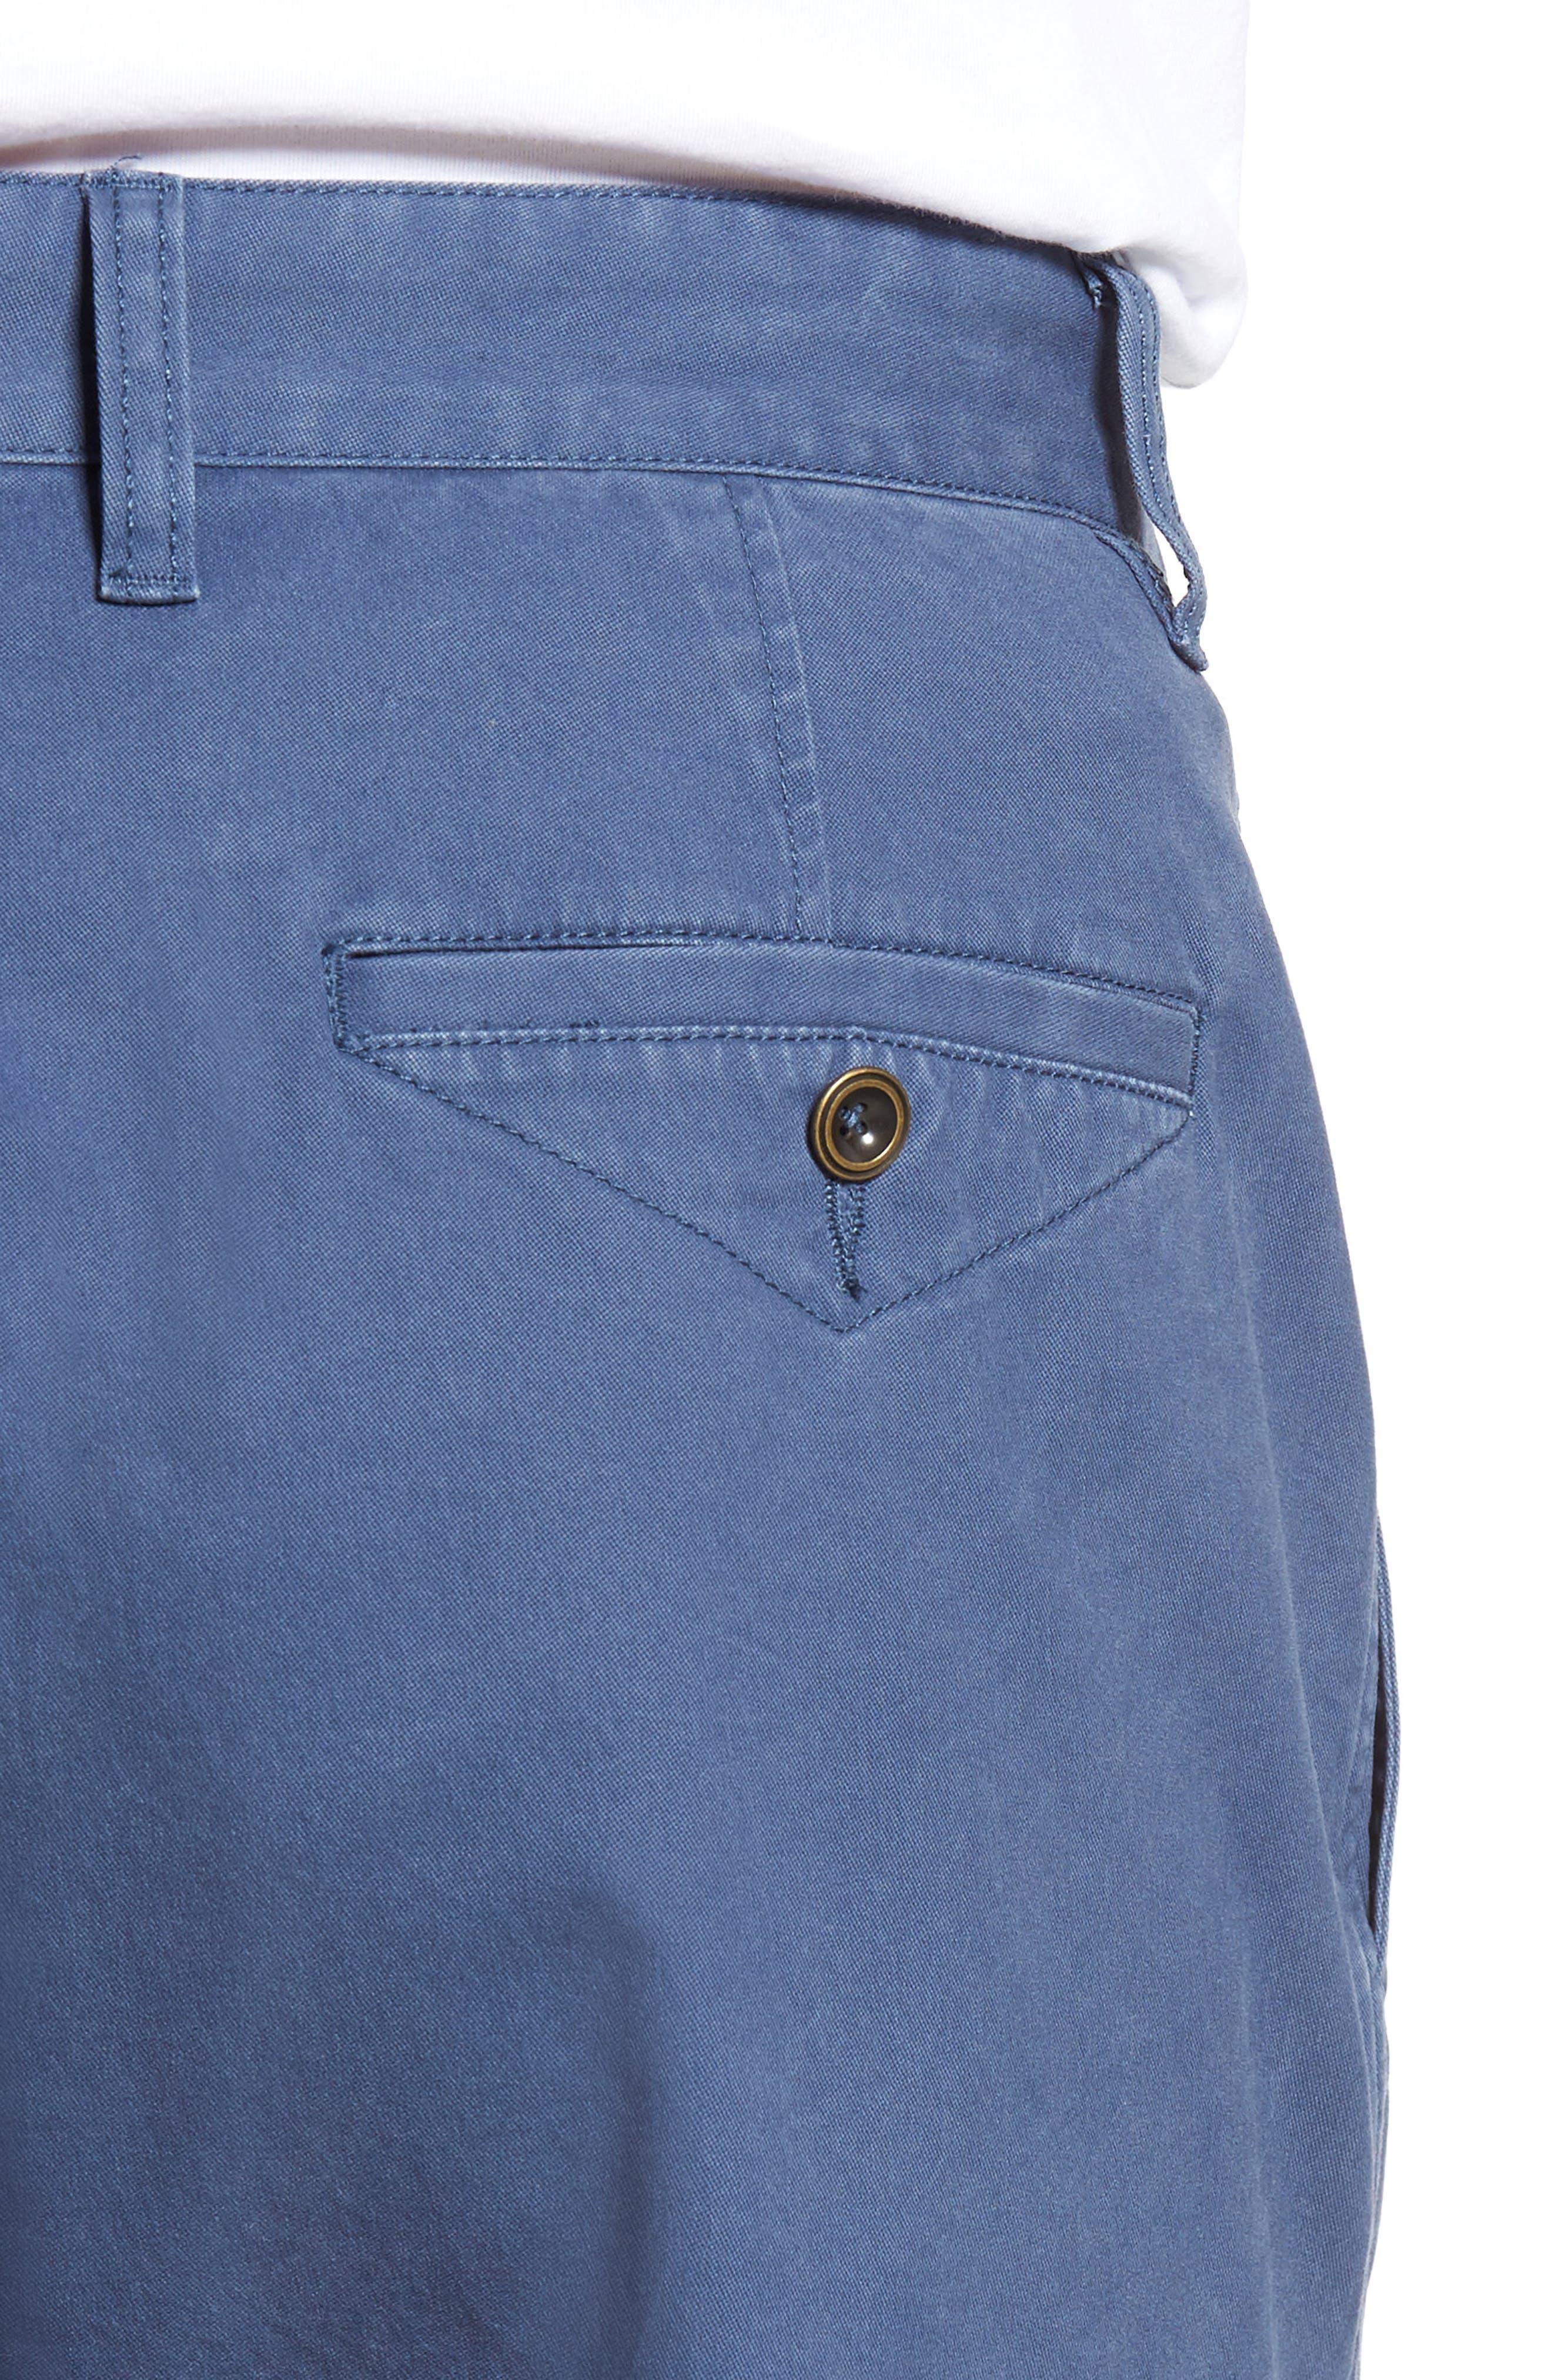 Glenburn Shorts,                             Alternate thumbnail 4, color,                             Indigo